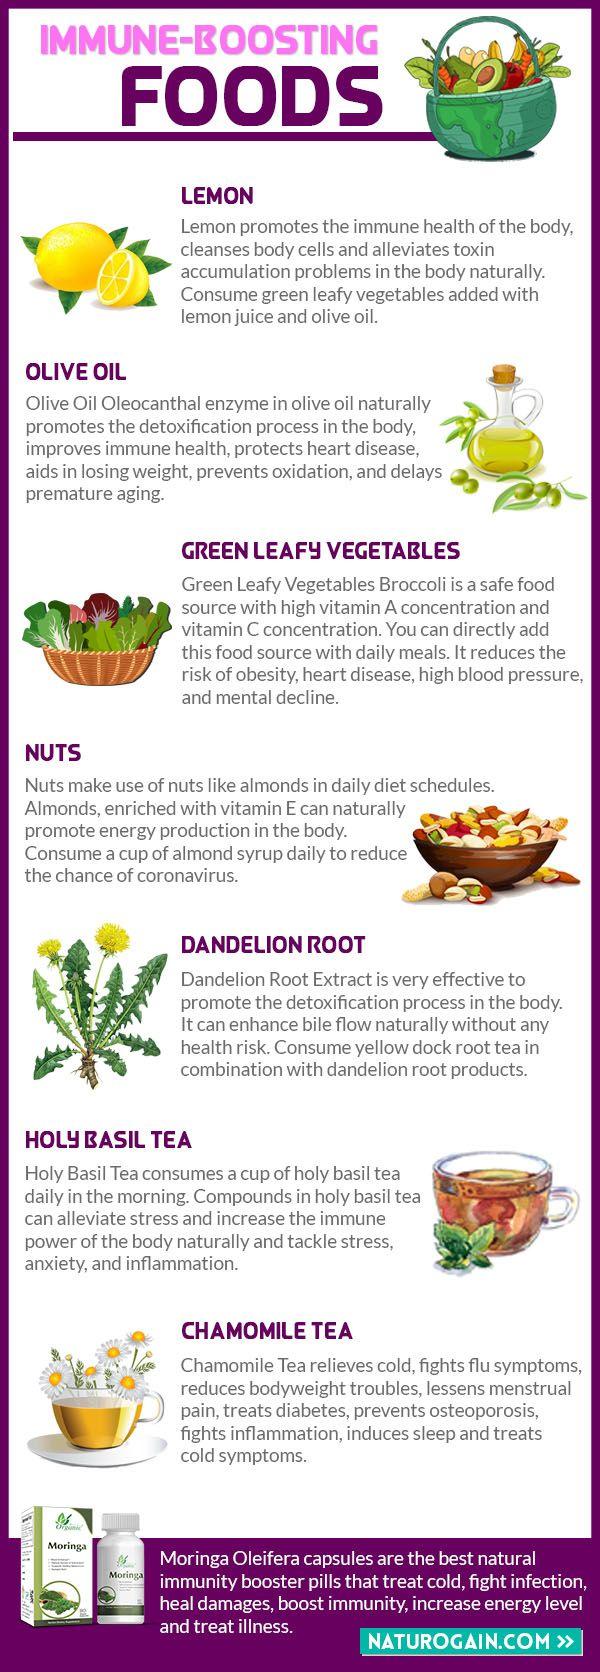 Moringa Oleifera Capsules in 2020 Immune boosting foods